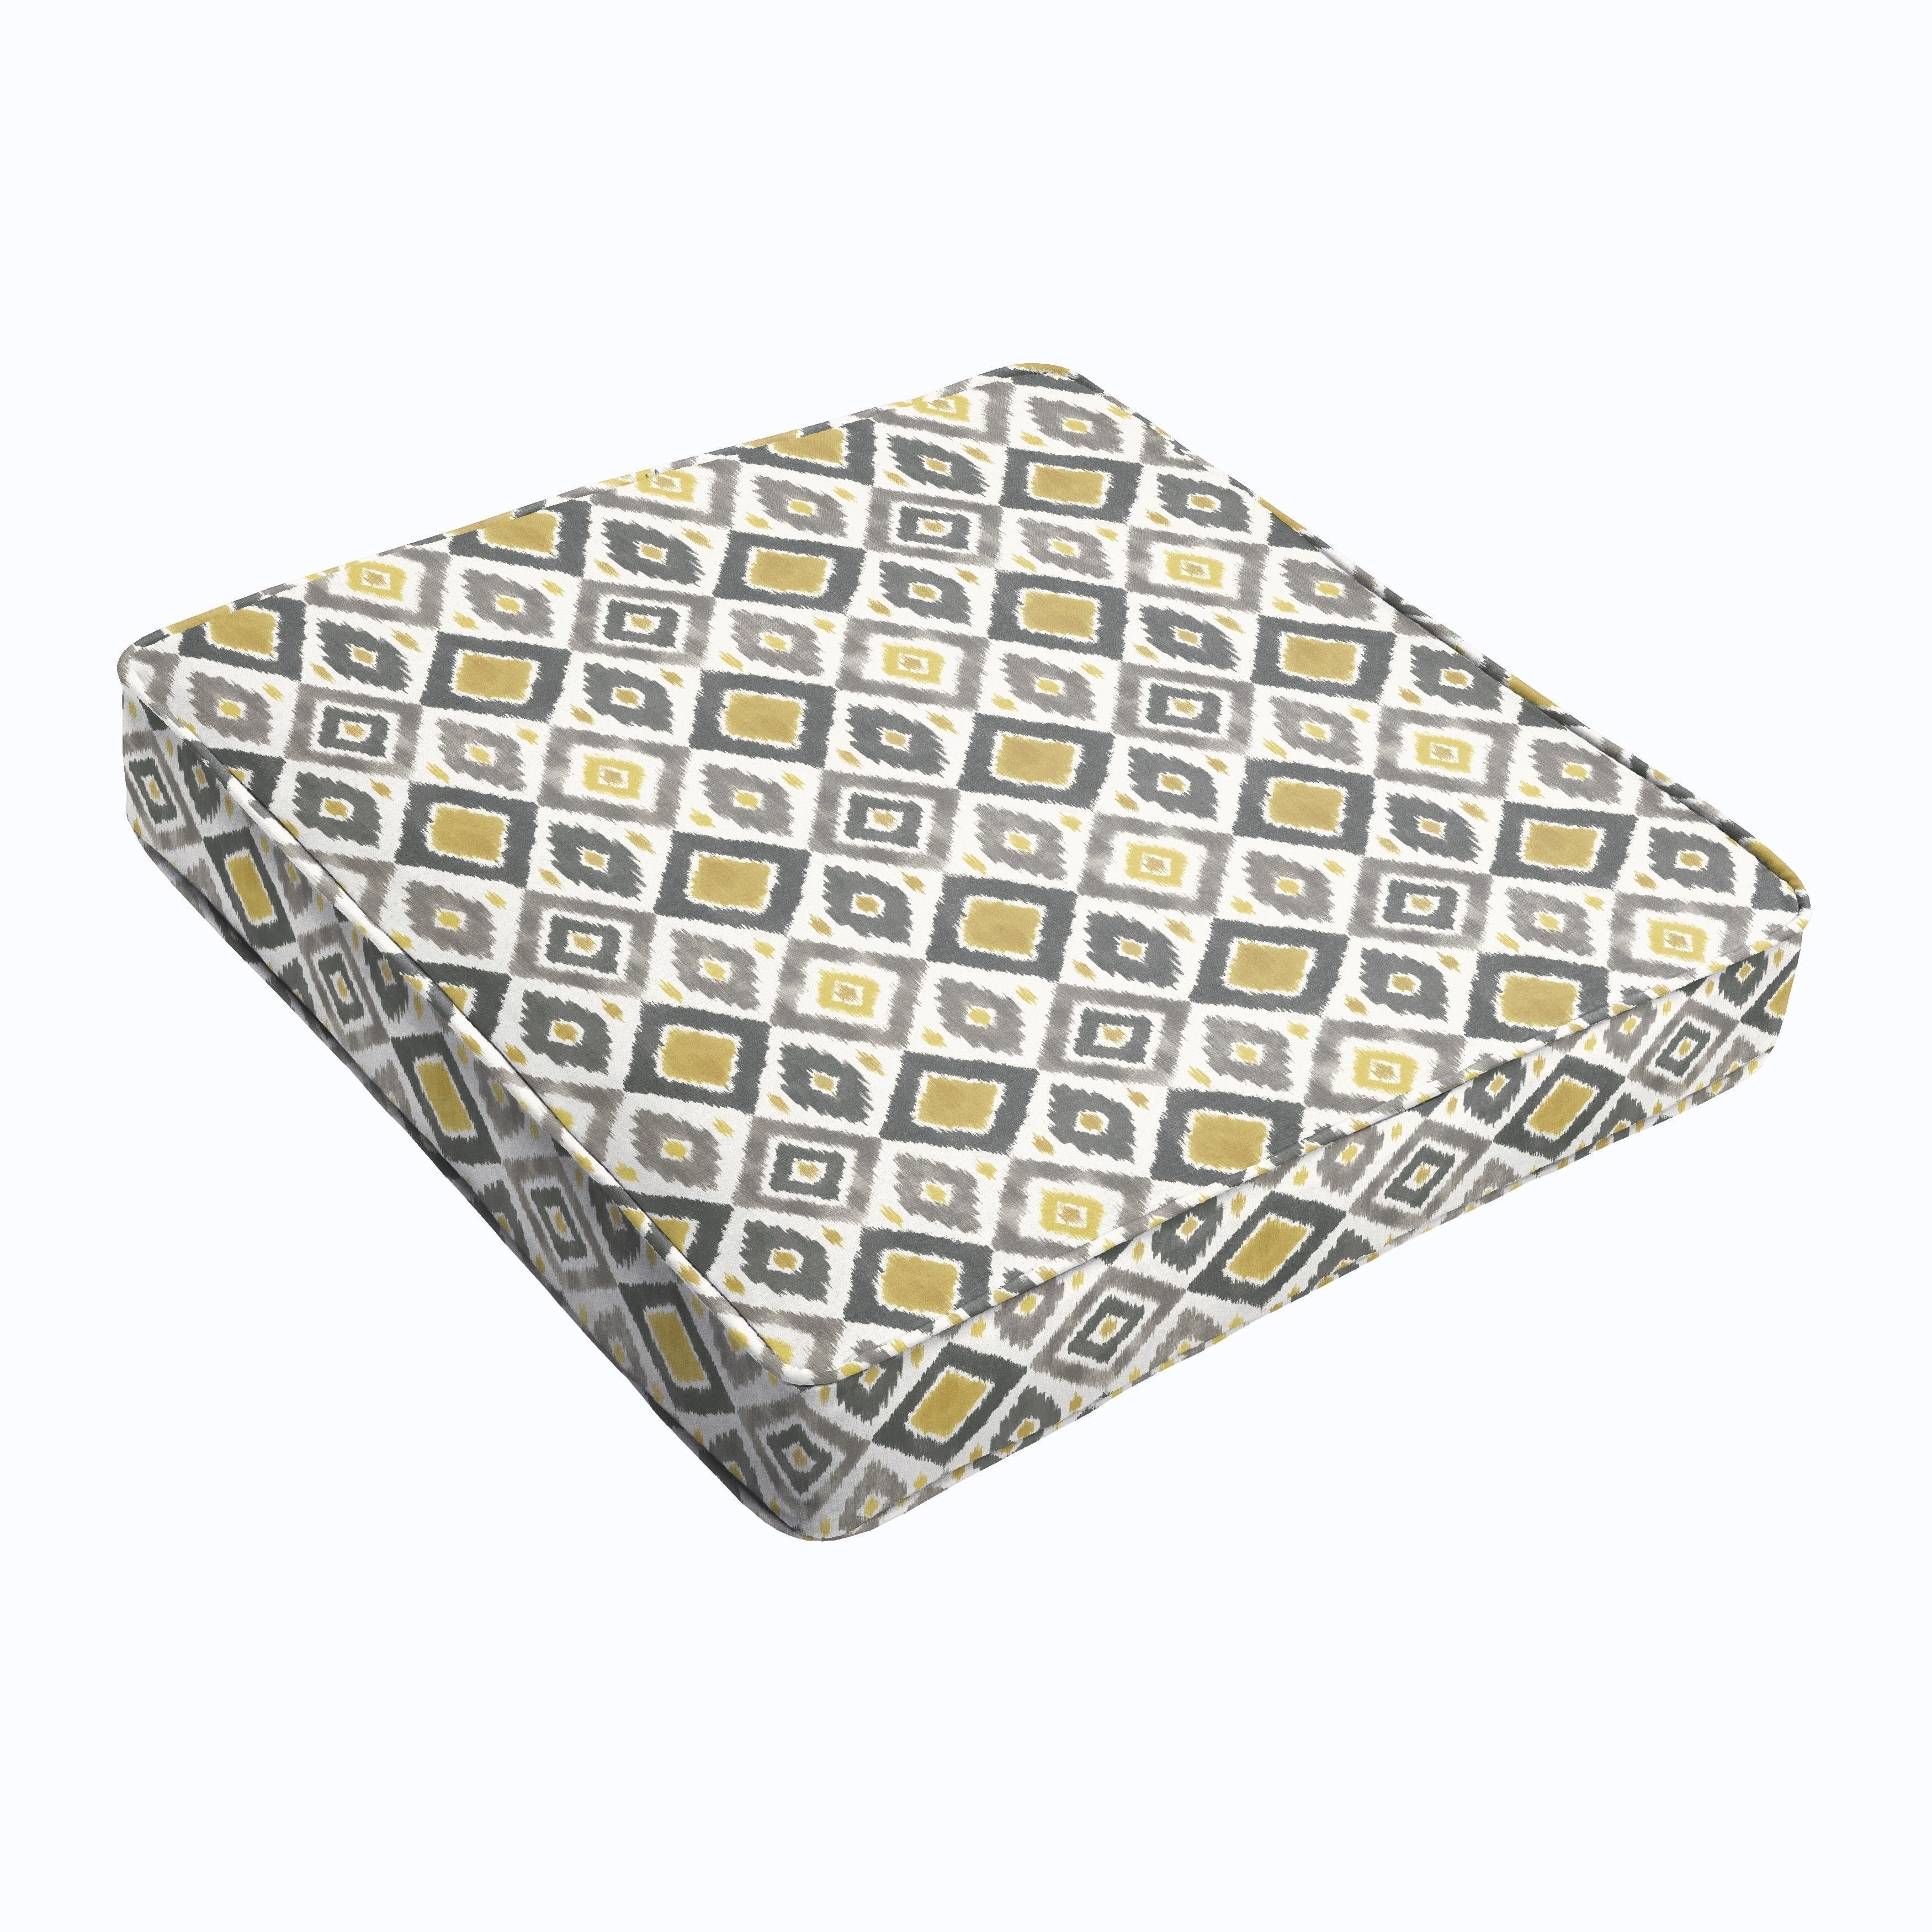 Grey Gold Diamonds Square Cushion Corded 19in x 19in x3 in